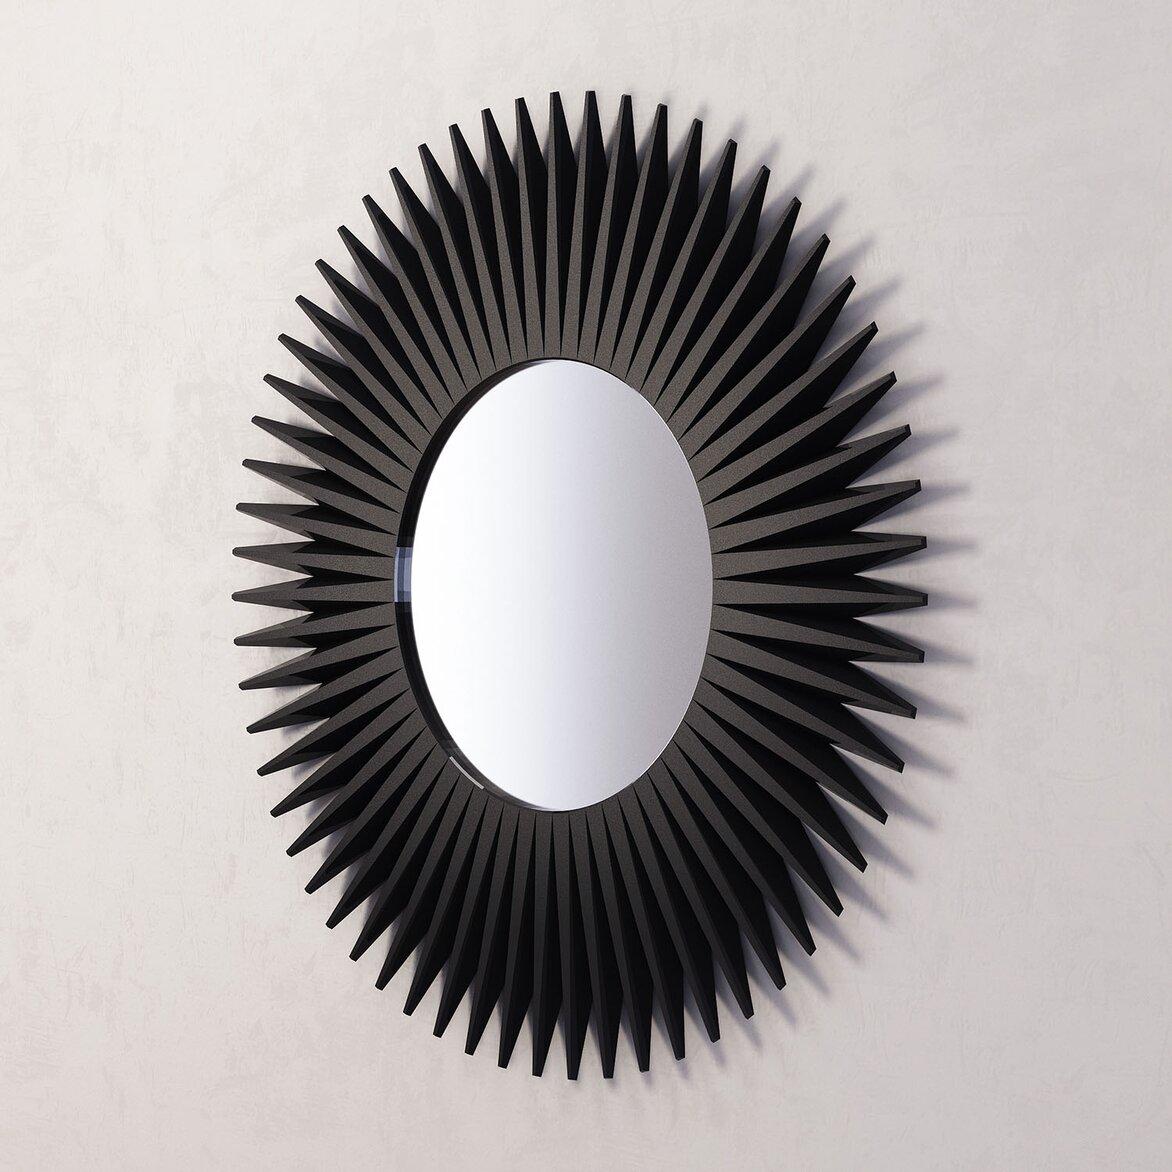 Зеркало-солнце Rays, черное (полуоборот)